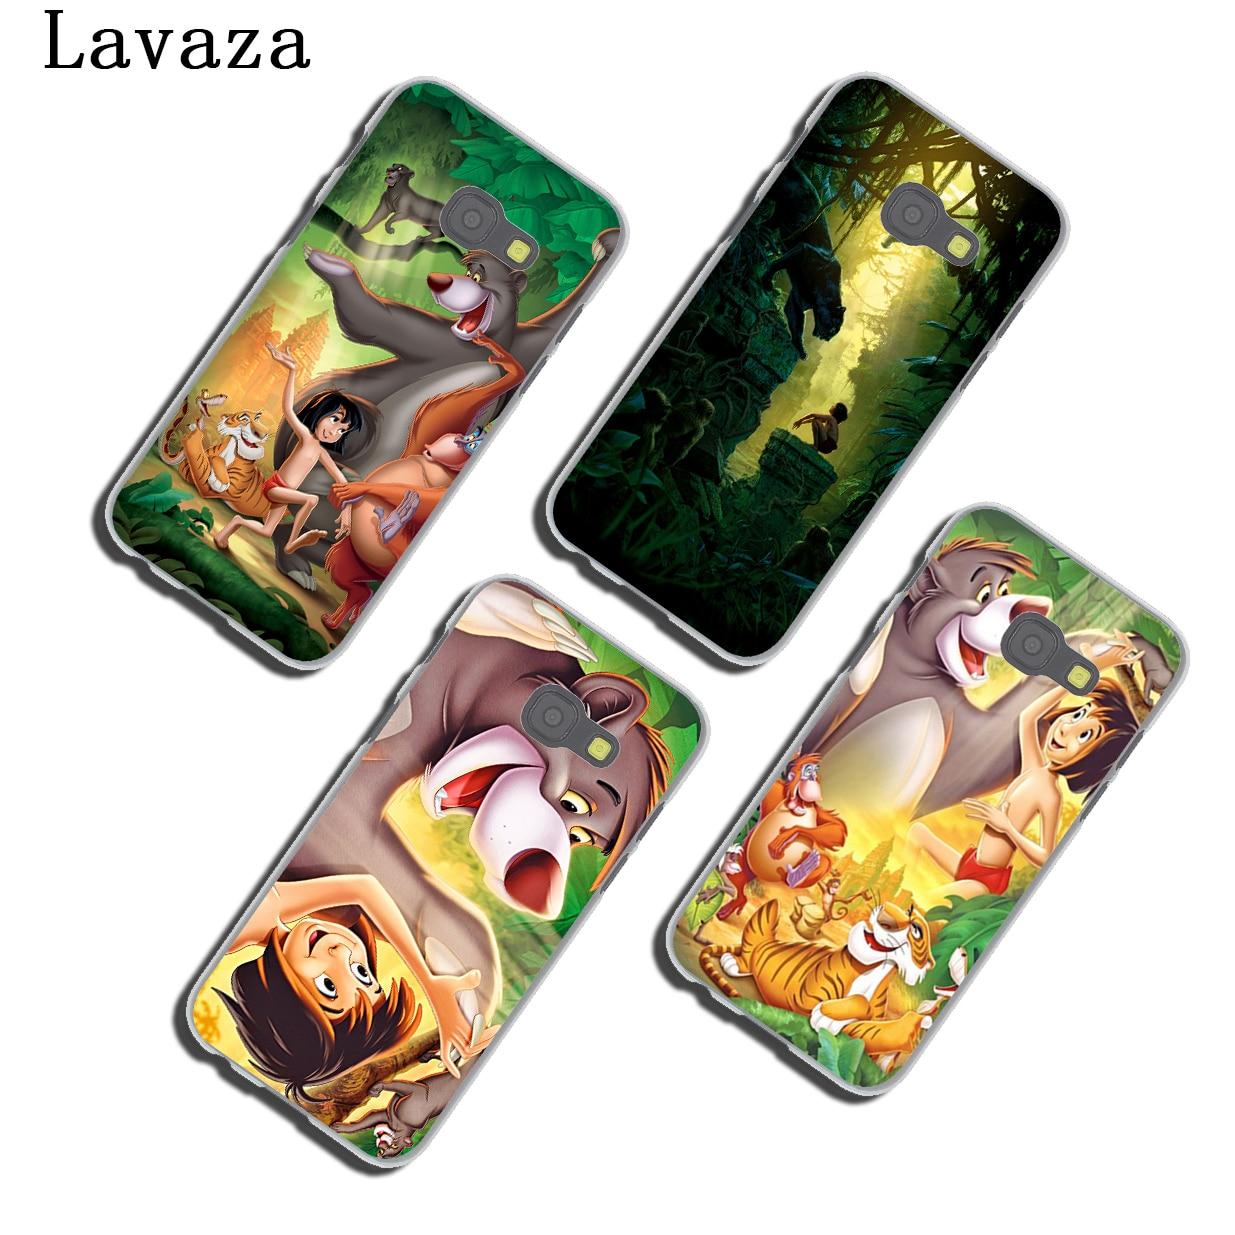 Lavaza Cartoon The Jungle Book Phone Shell Case for Samsung Galaxy A3 A7 A8 A5 2018 2017 2016 2015 Note 8 5 4 3 Grand Prime 2